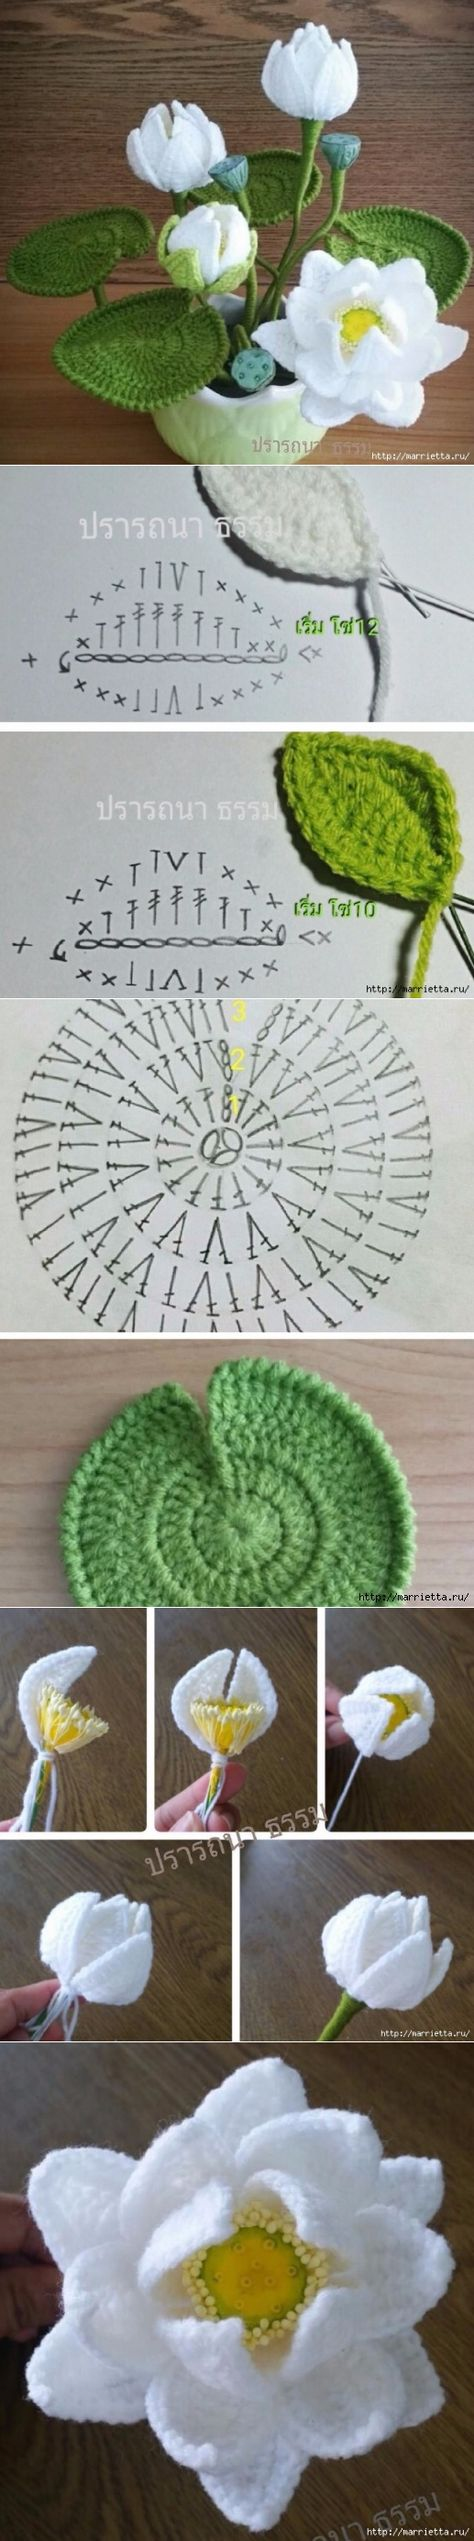 182 besten Häkelblumen Bilder auf Pinterest | Blumen häkeln, Basteln ...